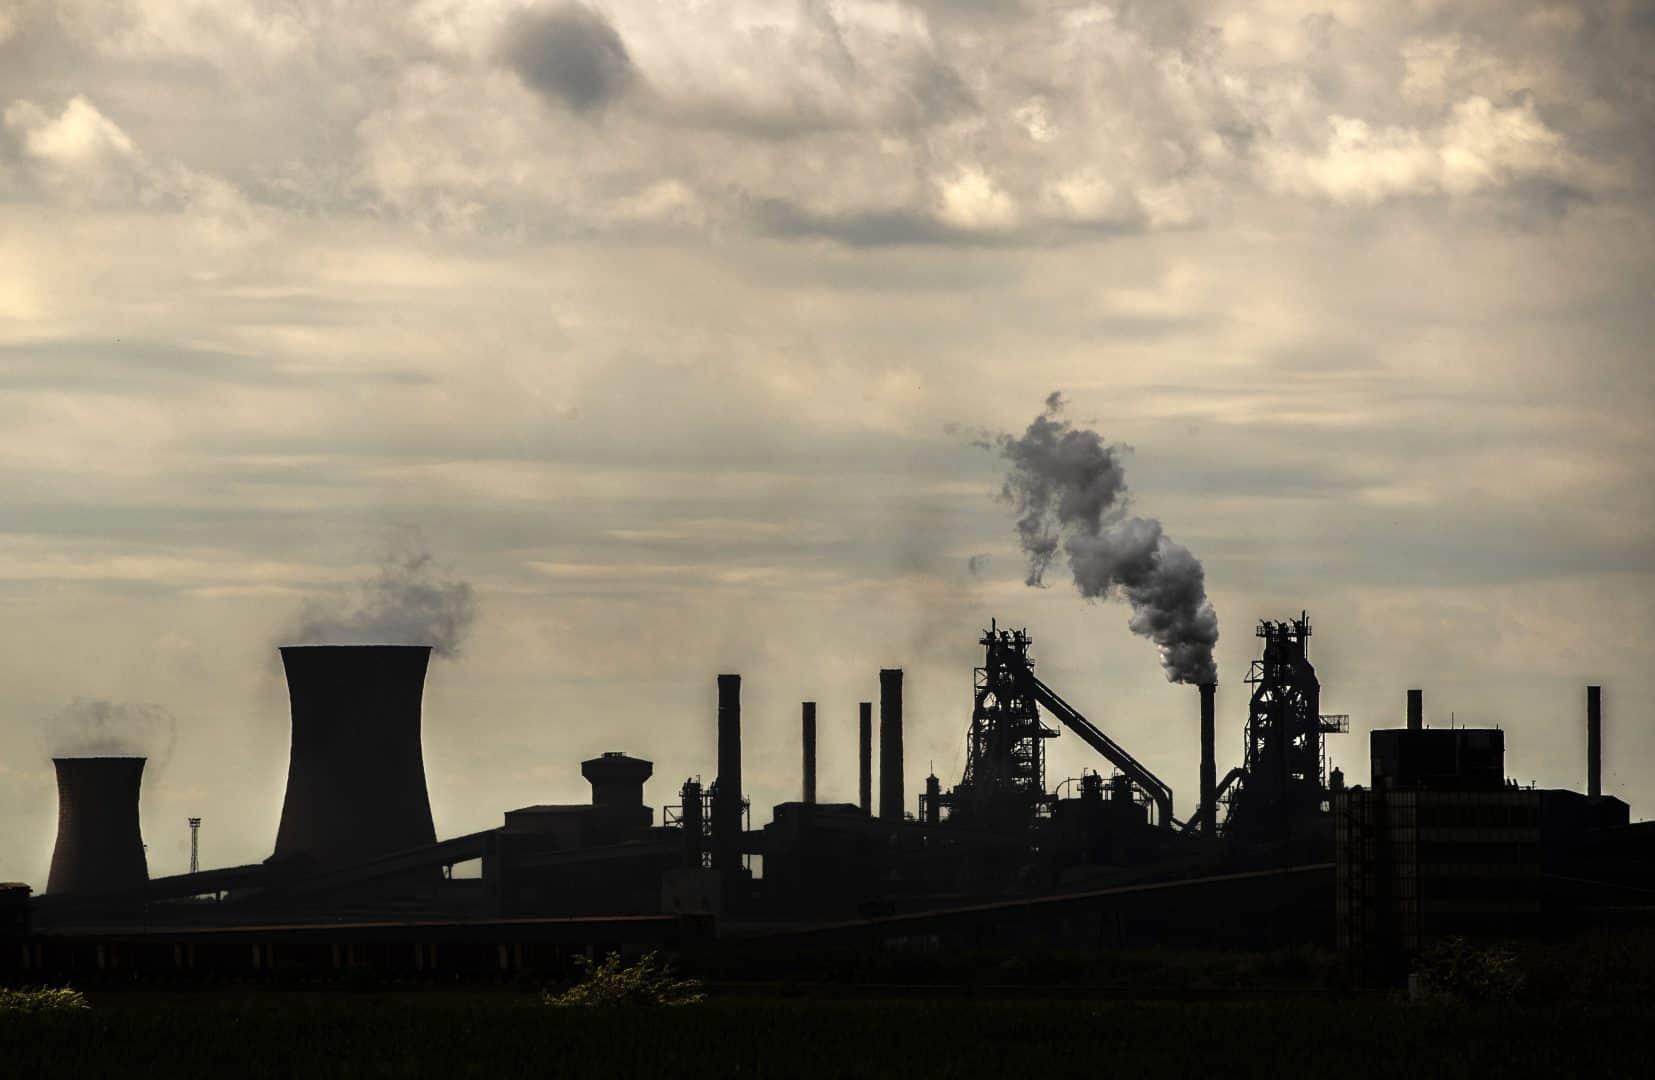 British steel manufacturing plant